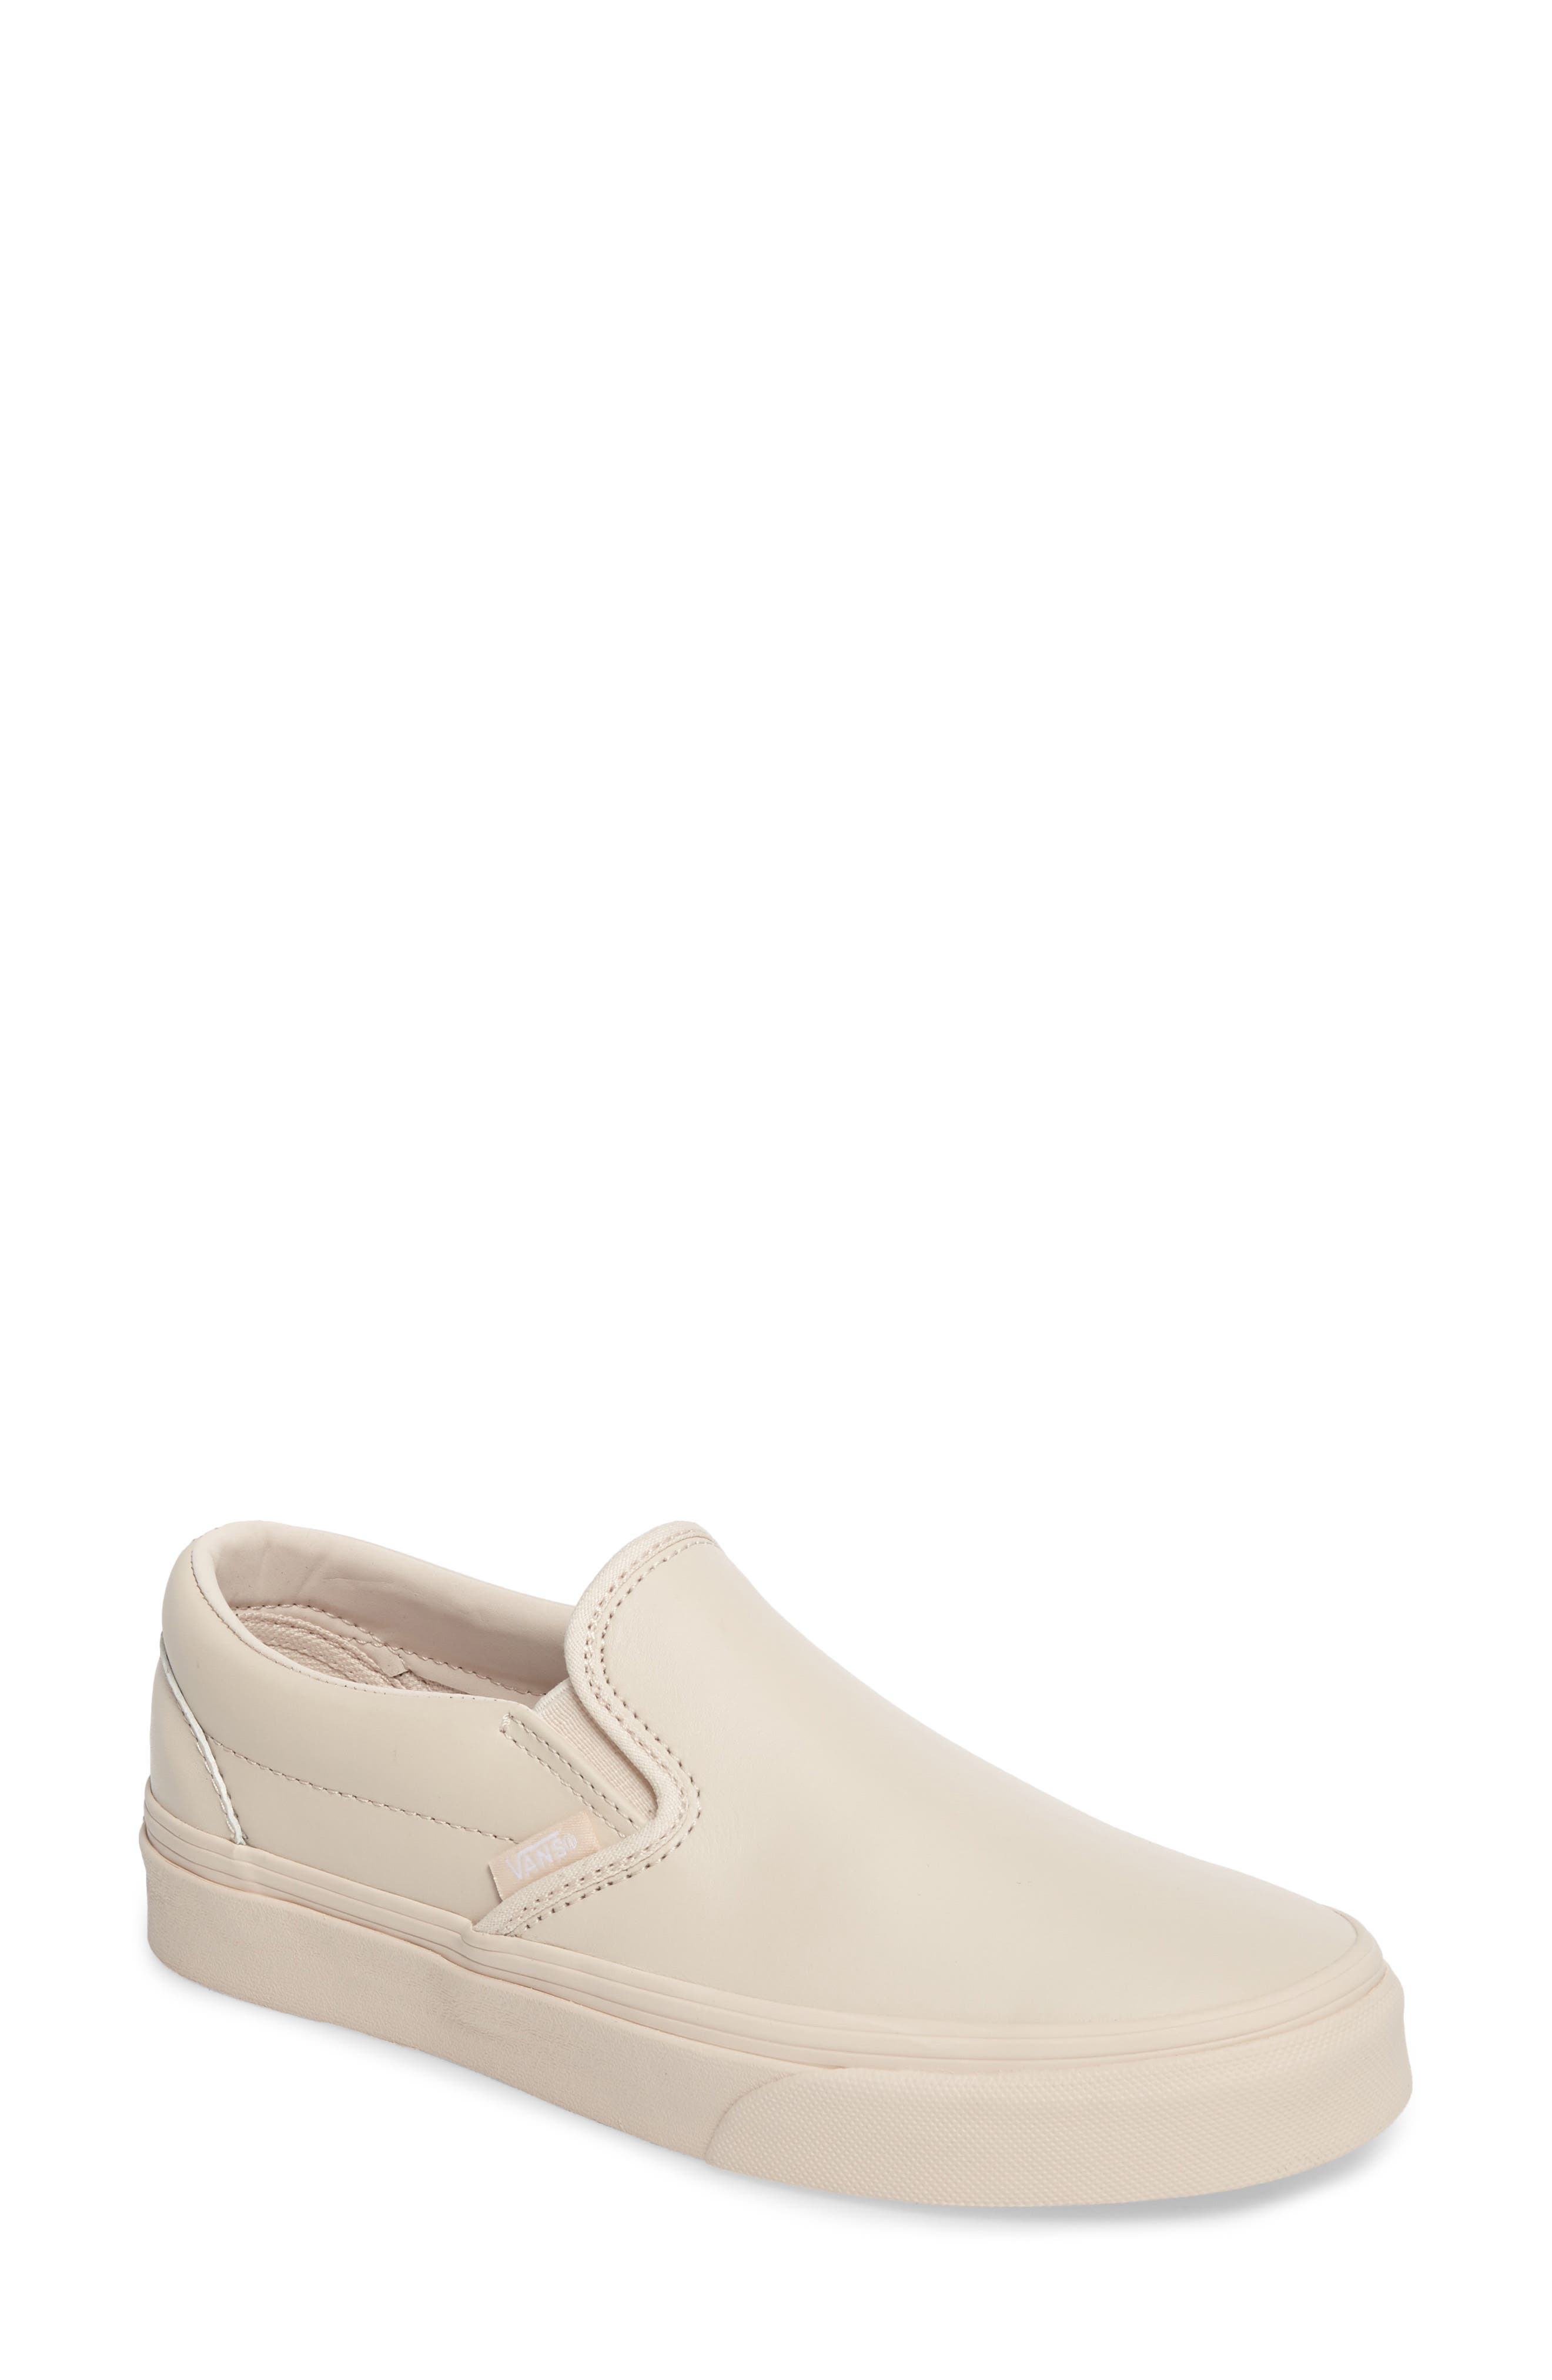 Vans Classic DX Slip-On Sneaker (Women)